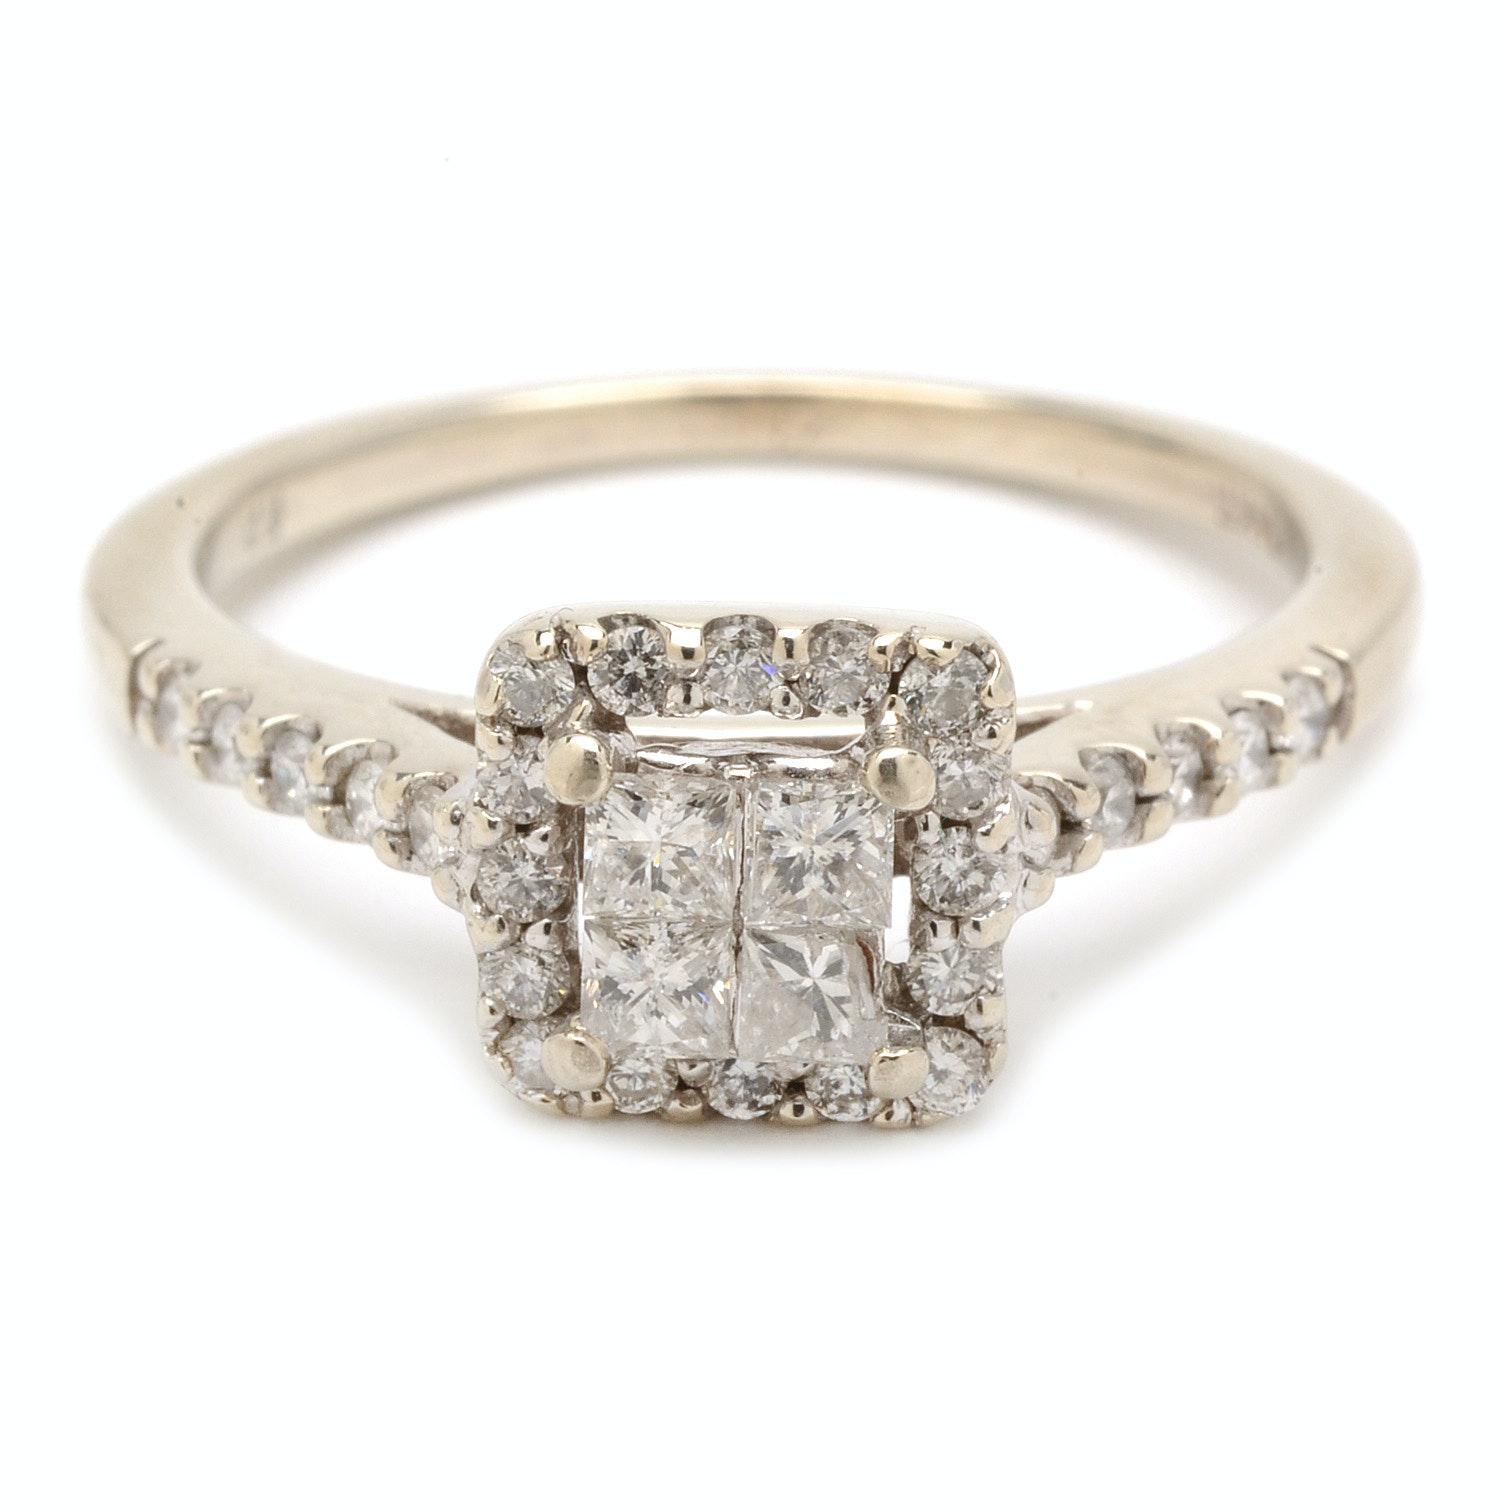 14K White Gold Princess Cut Diamond Cluster Ring